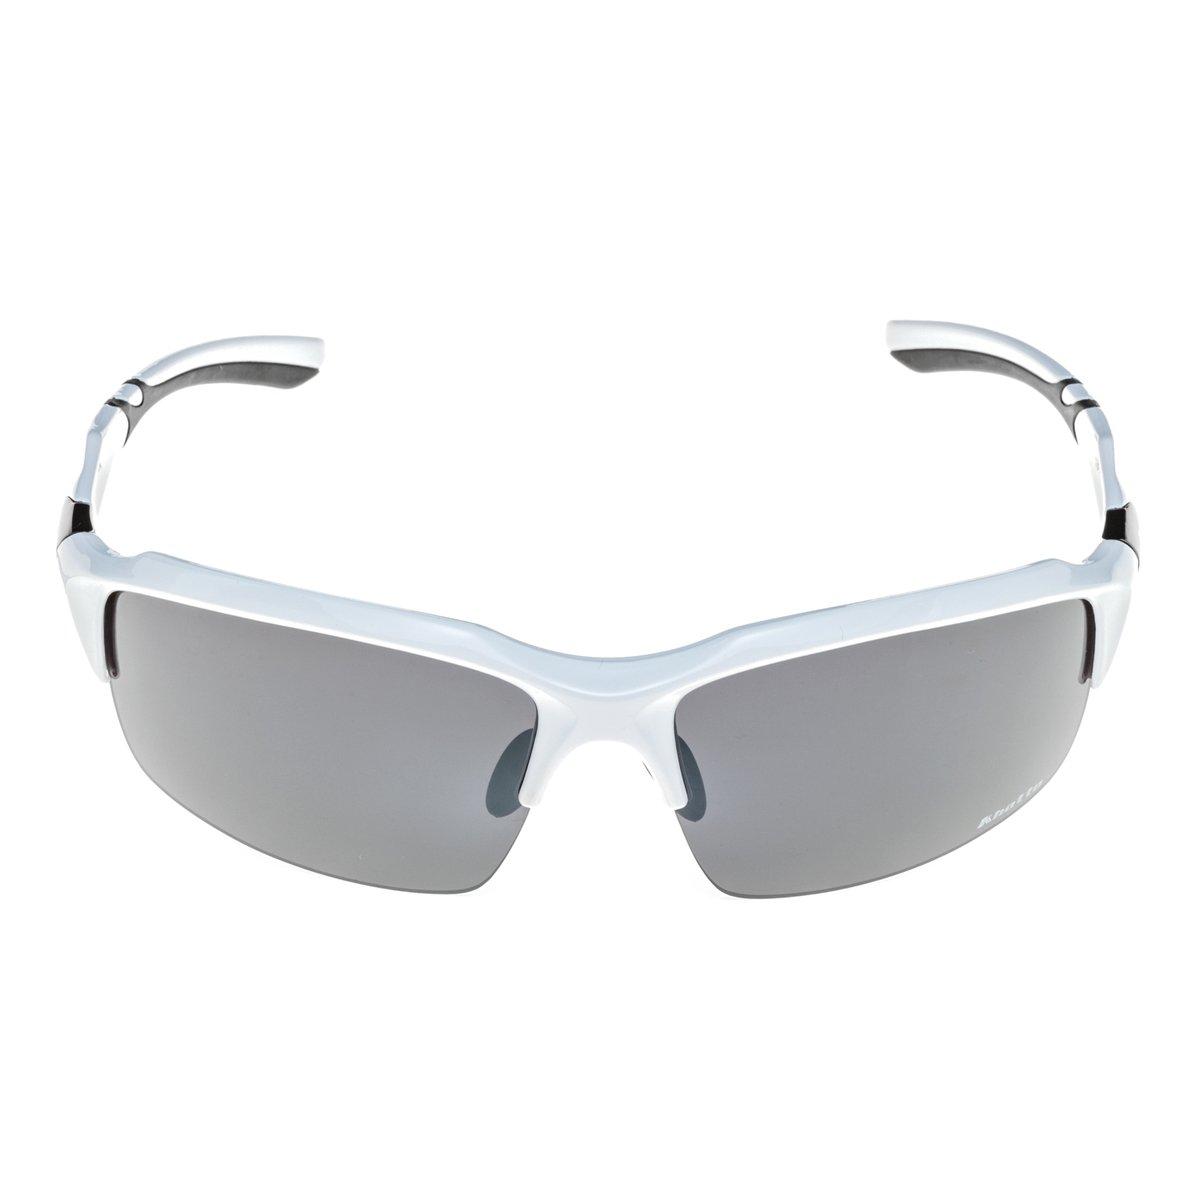 4cae1449f Óculos de Sol Khatto KTS18163TR90 - Compre Agora | Zattini